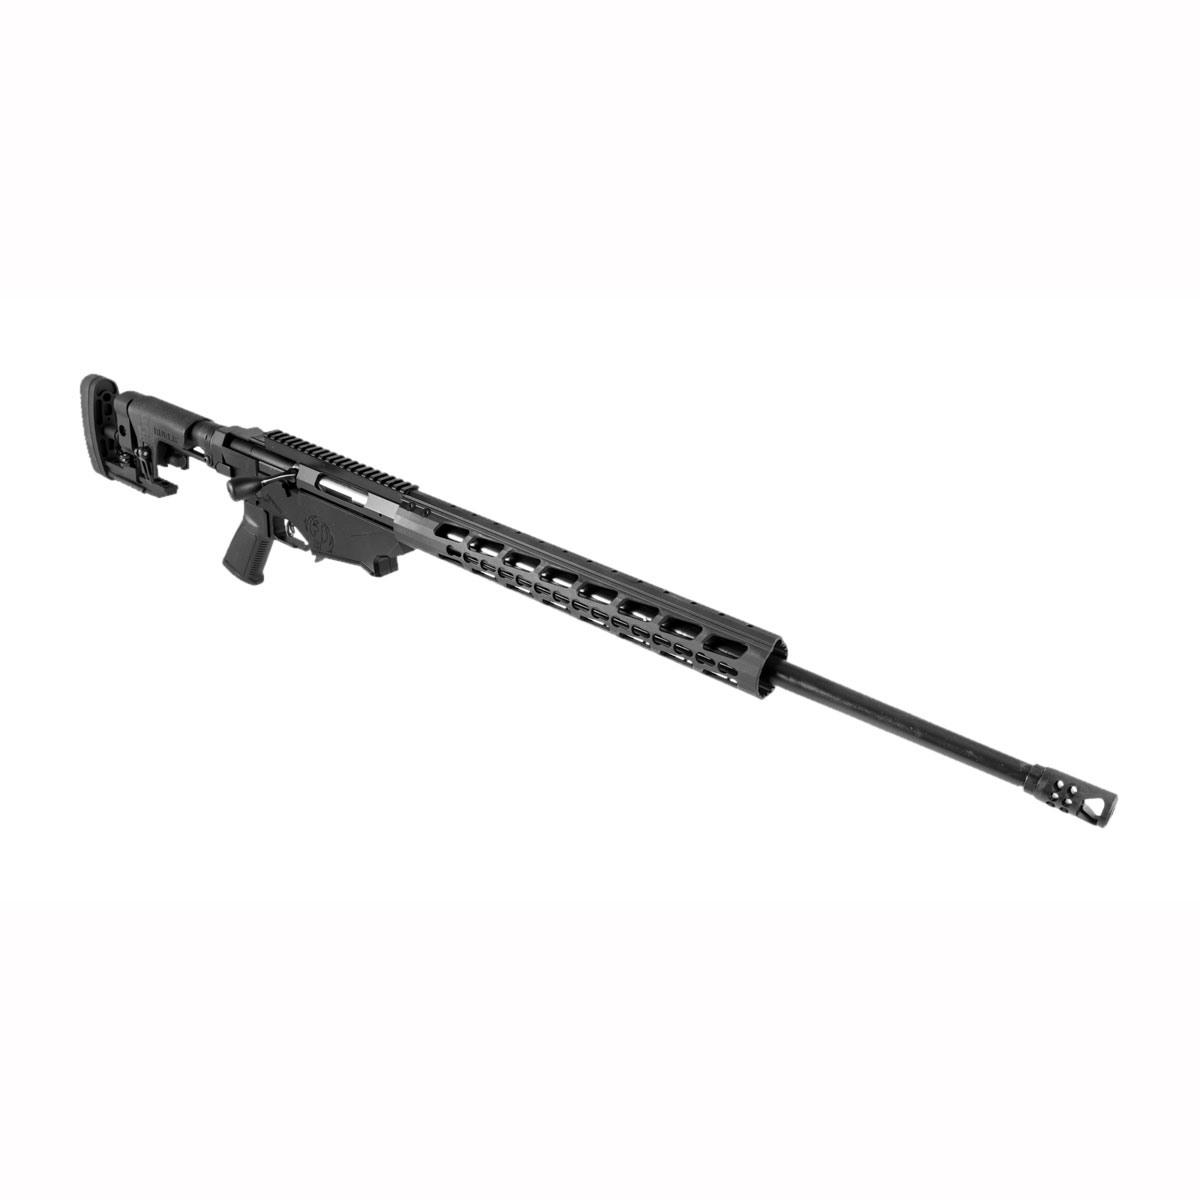 Ruger Precision Rifle 6mm Creedmoor 24 10 1